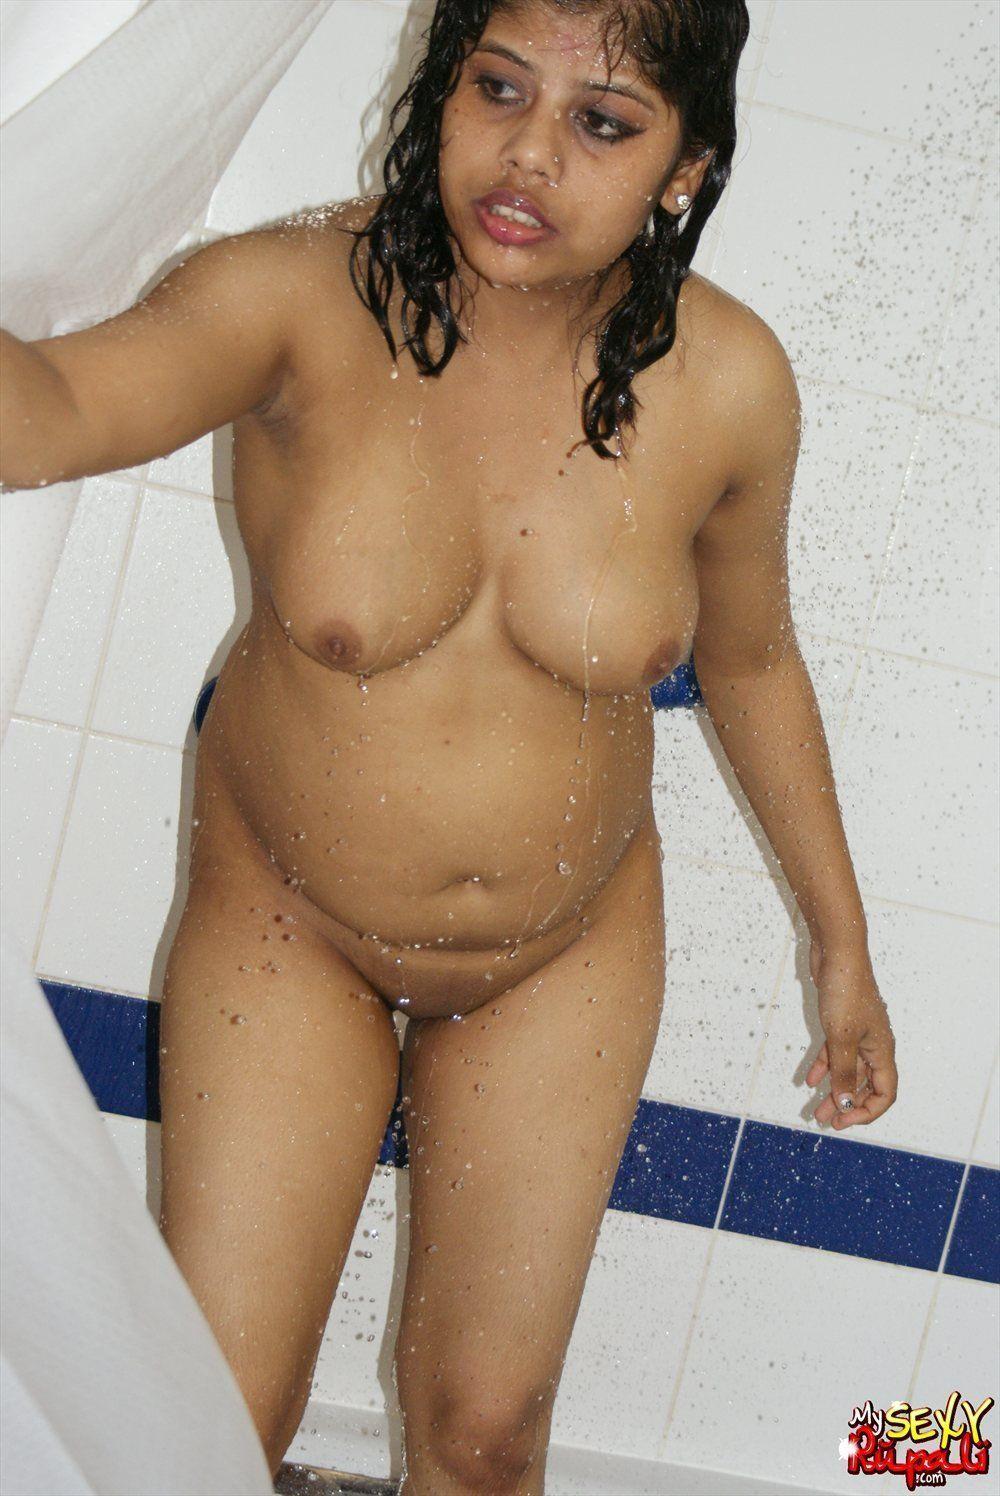 Black masturbating men naked marques houston